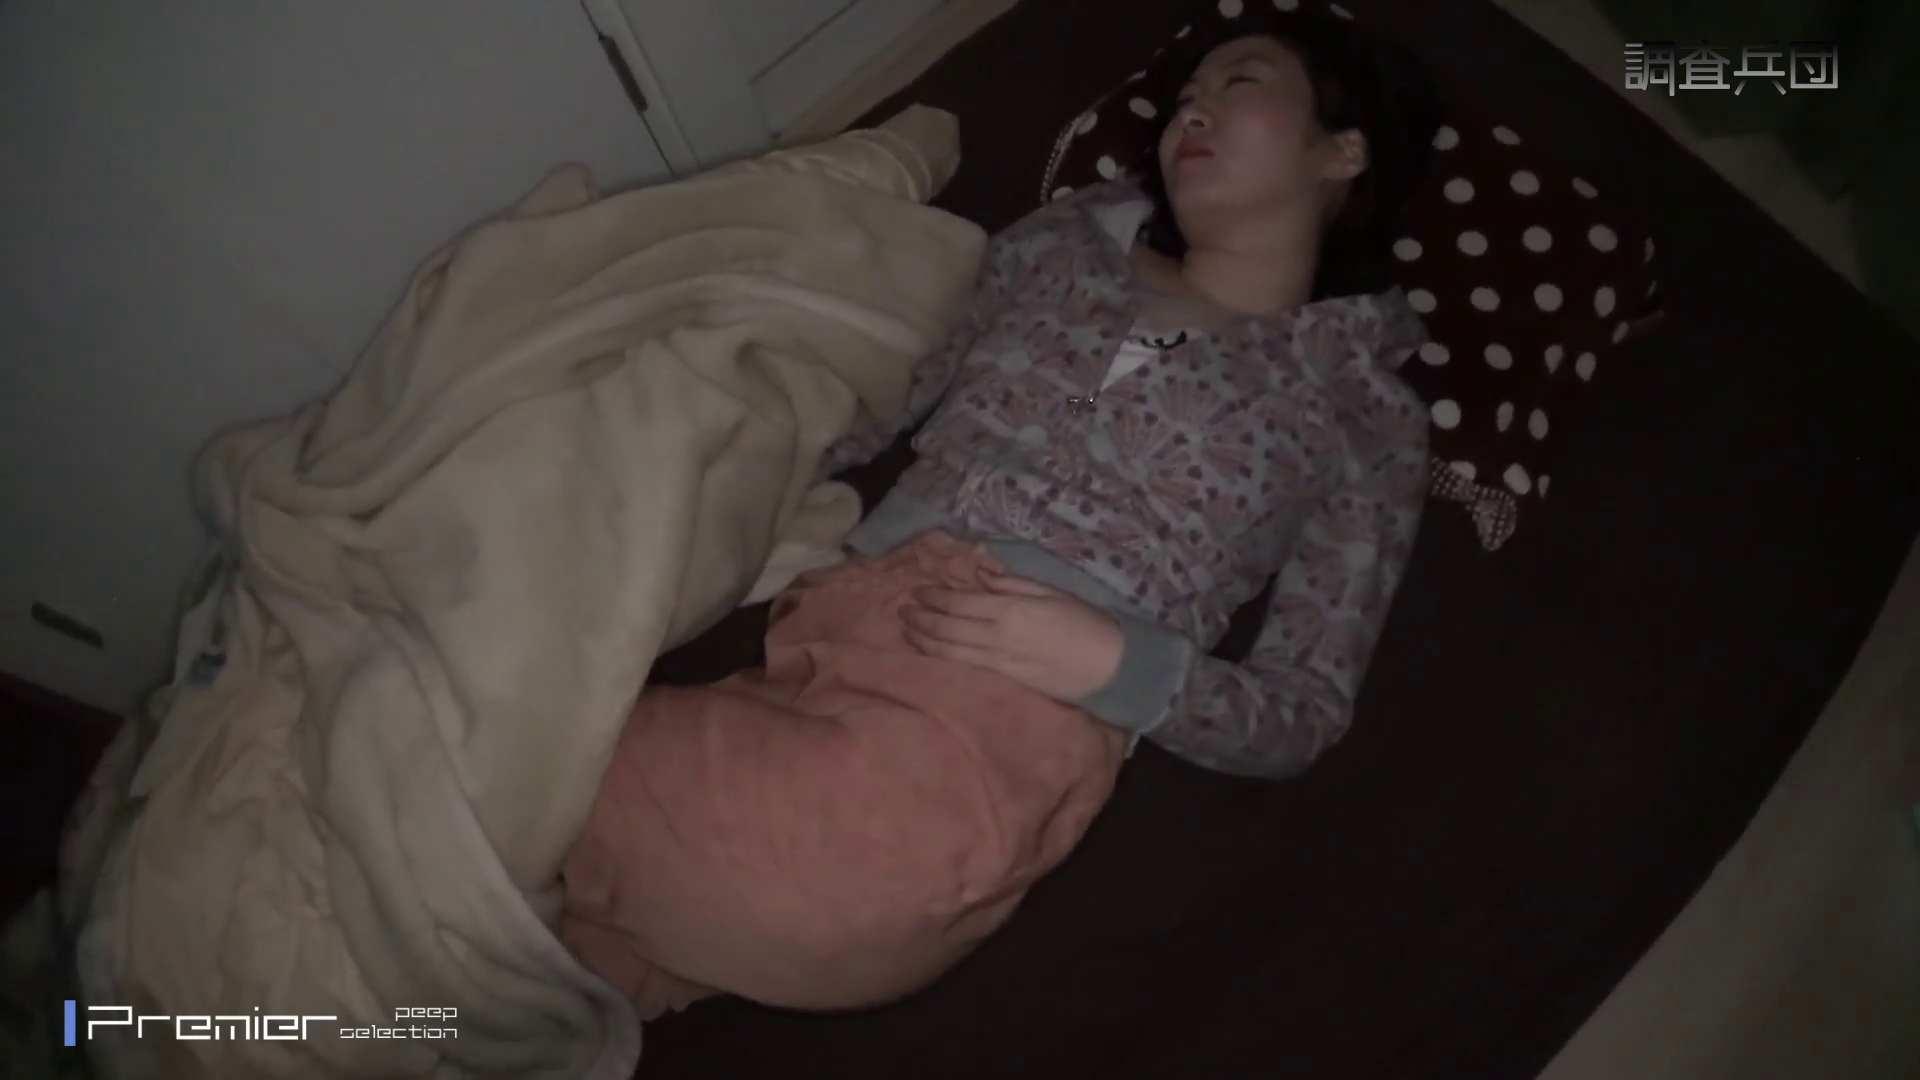 【RE:~反撃の悪戯~】vol.47 オマンコ SEX無修正画像 85PIX 29